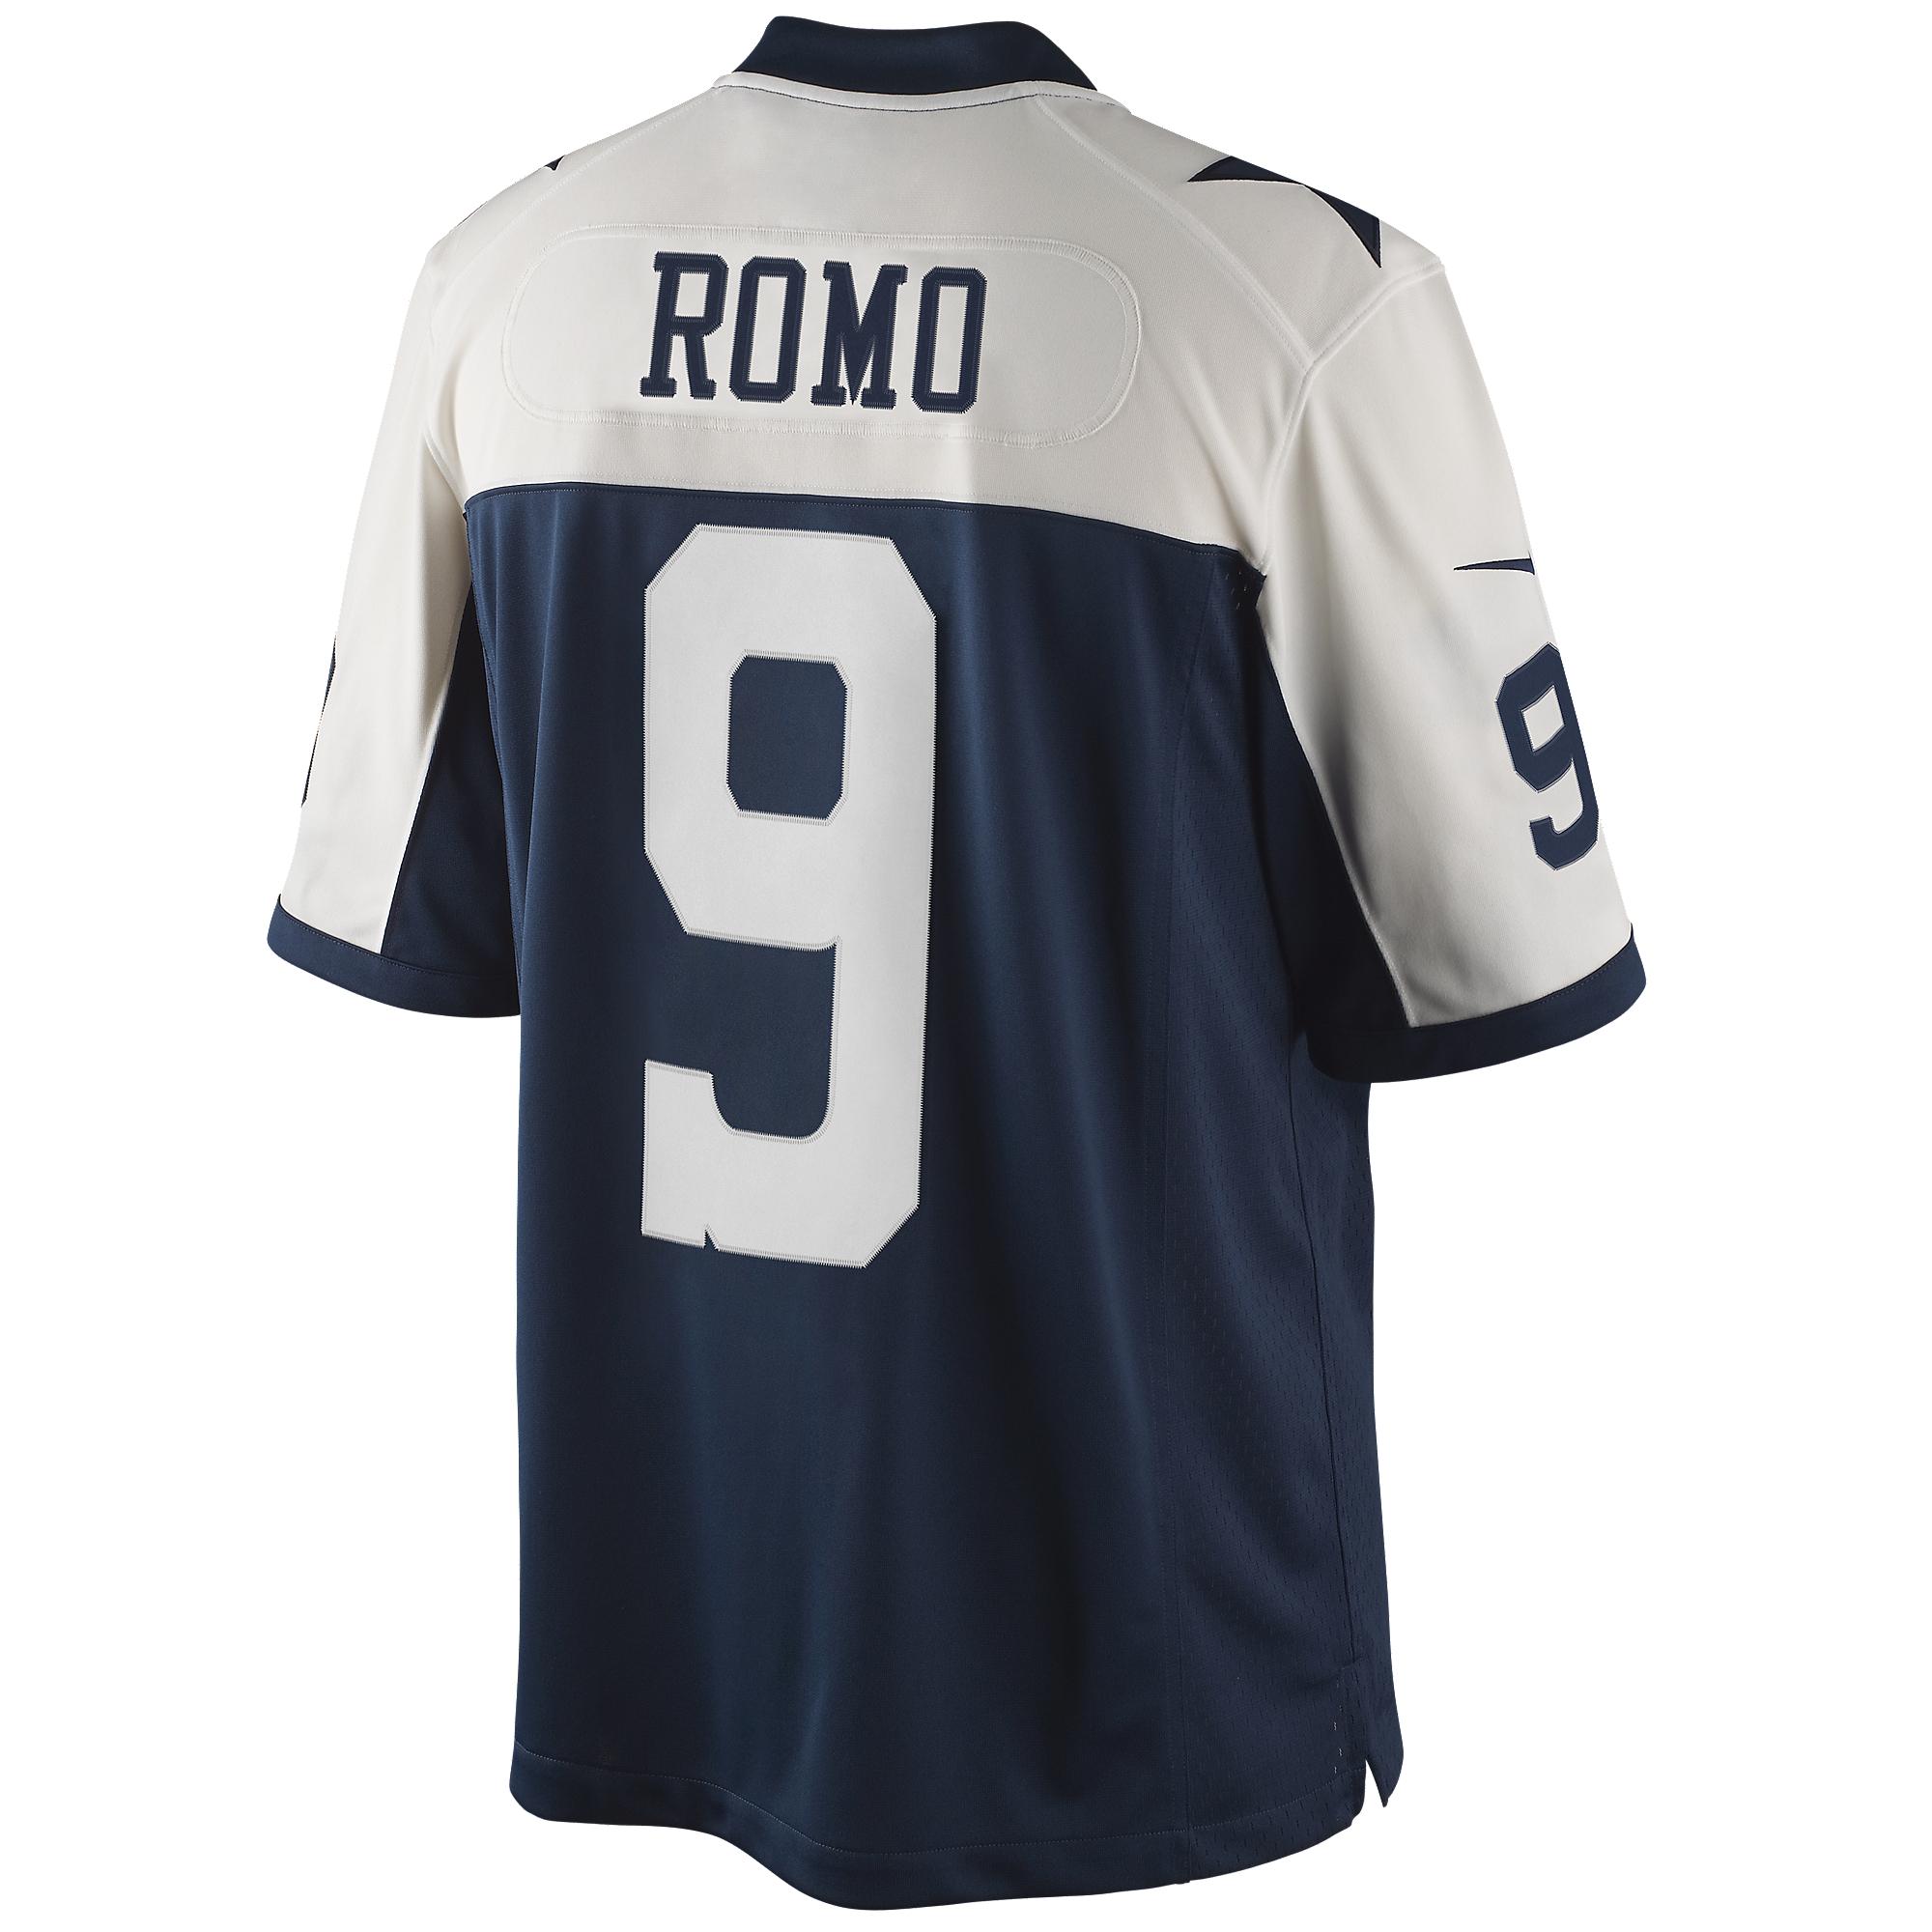 1b40b11feb6 Dallas Cowboys Tony Romo #9 Nike Limited Throwback Jersey   Dallas Cowboys  Pro Shop